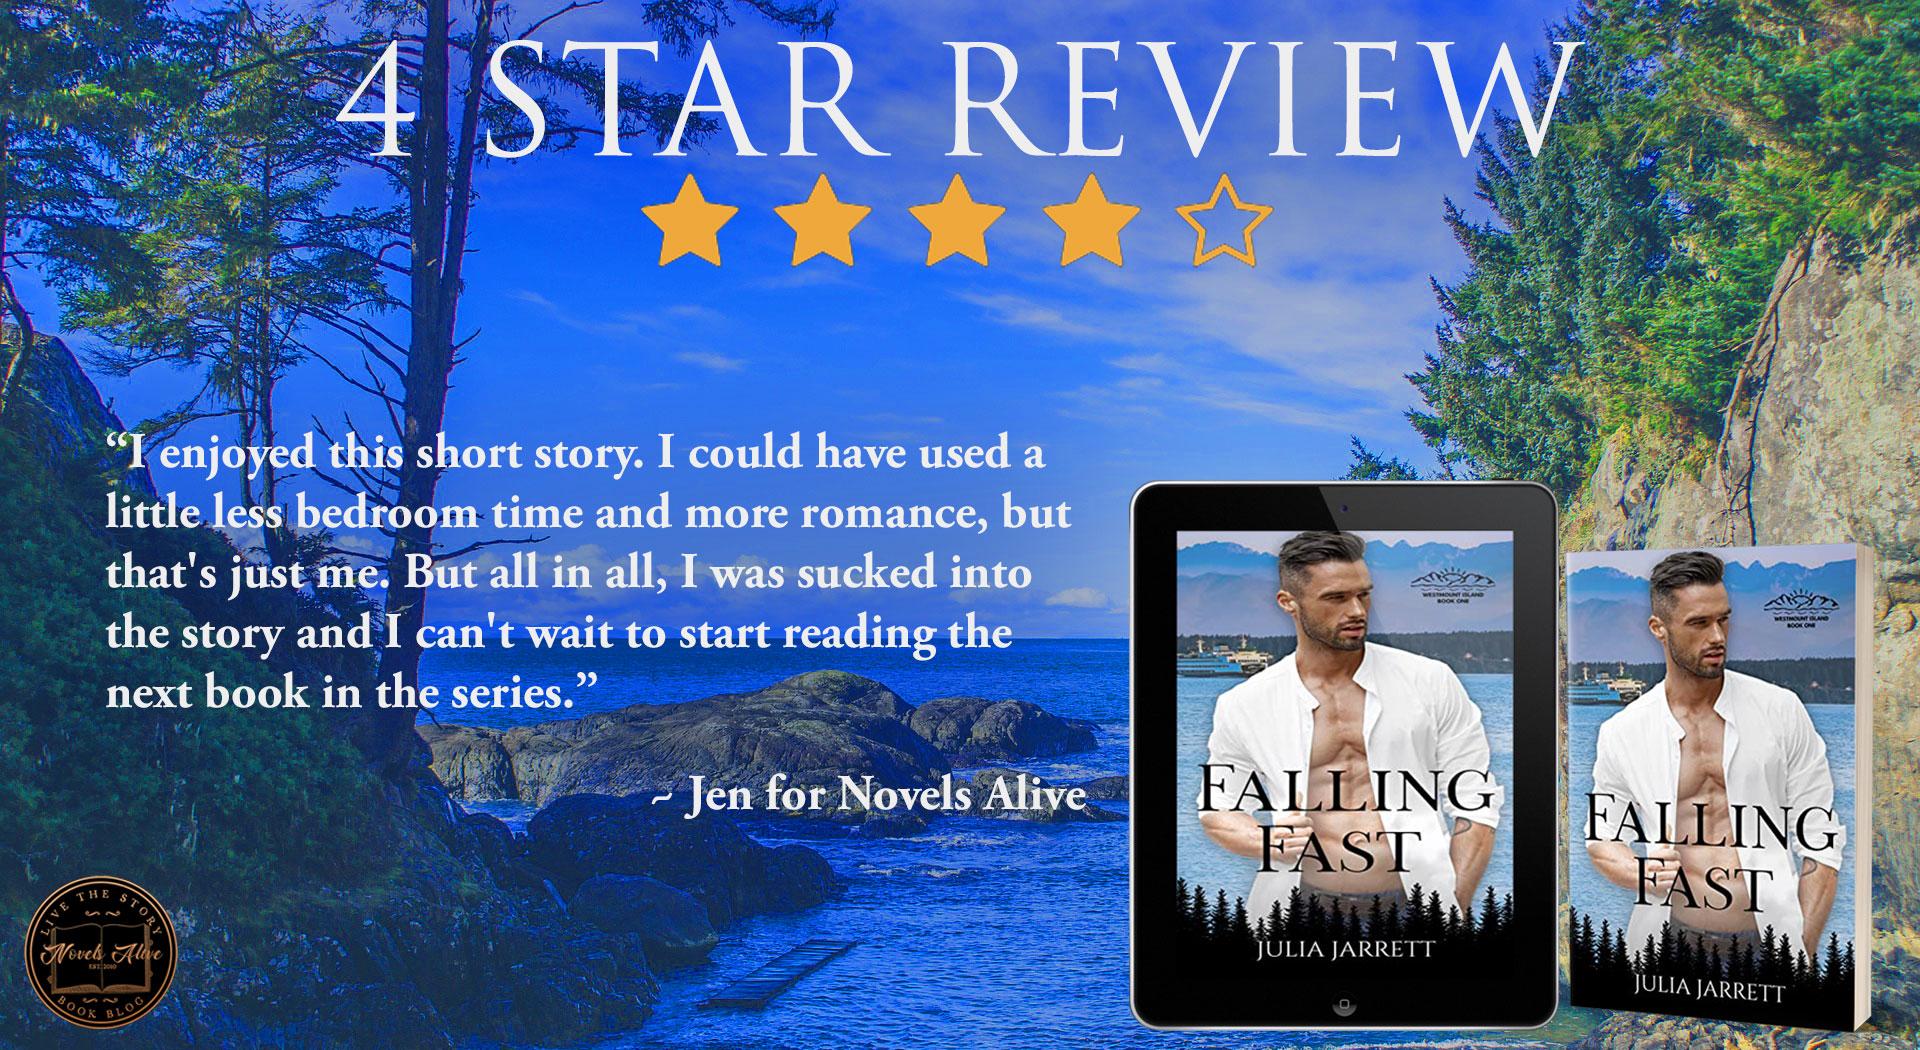 FallingFast-REVIEW-FB